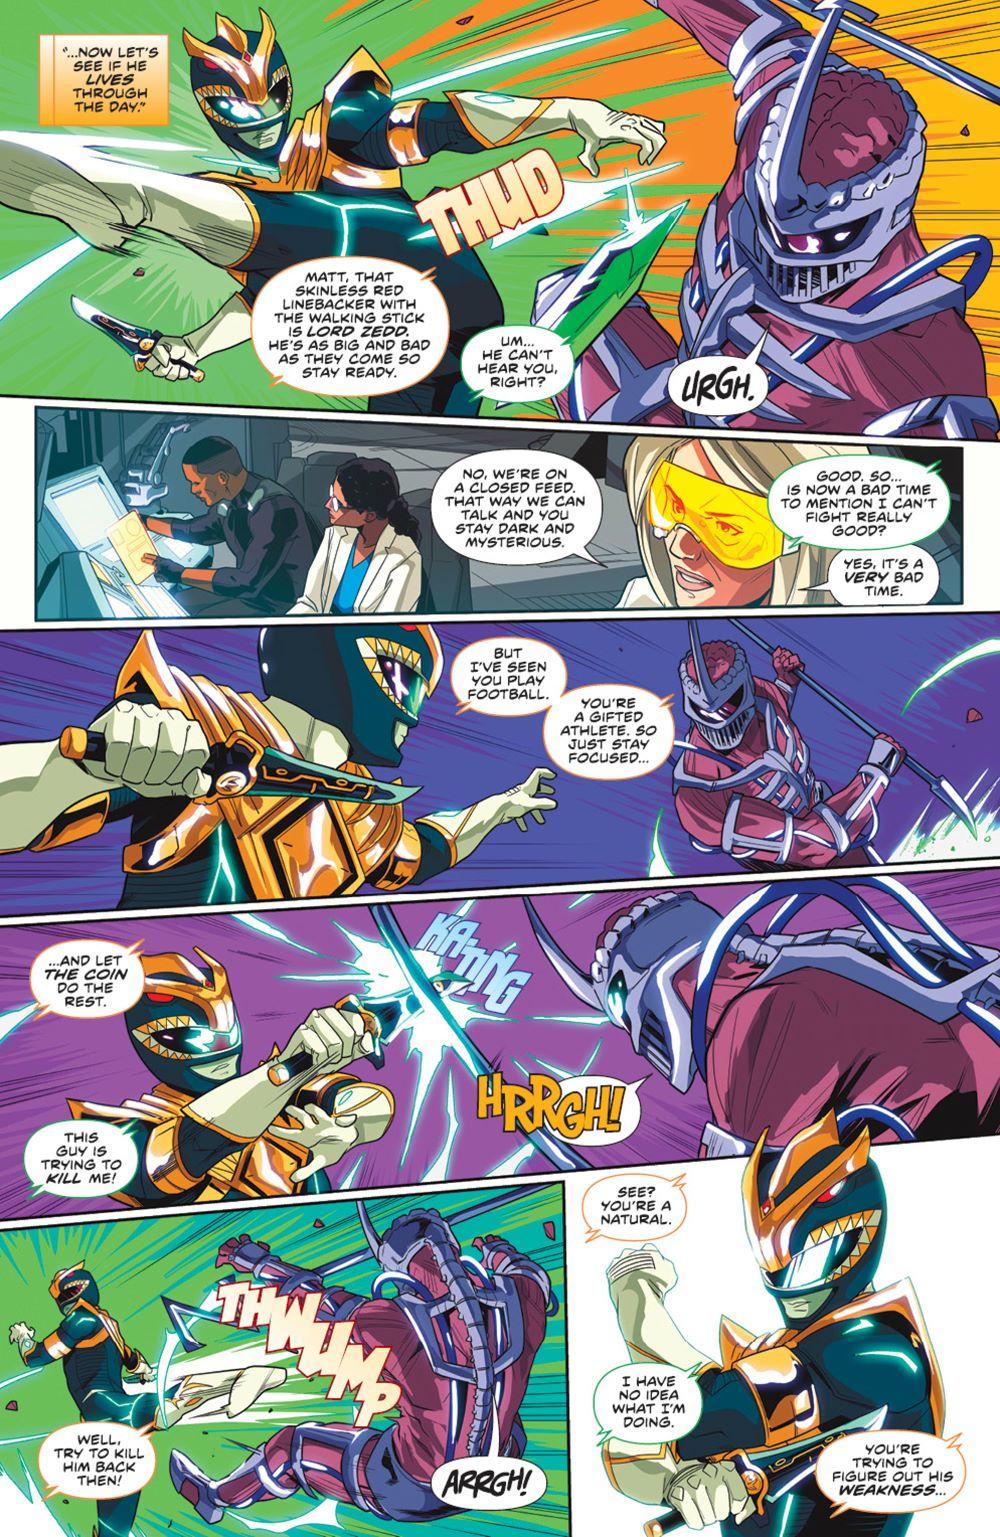 MightyMorphin_005_PRESS_7 ComicList Previews: MIGHTY MORPHIN #5